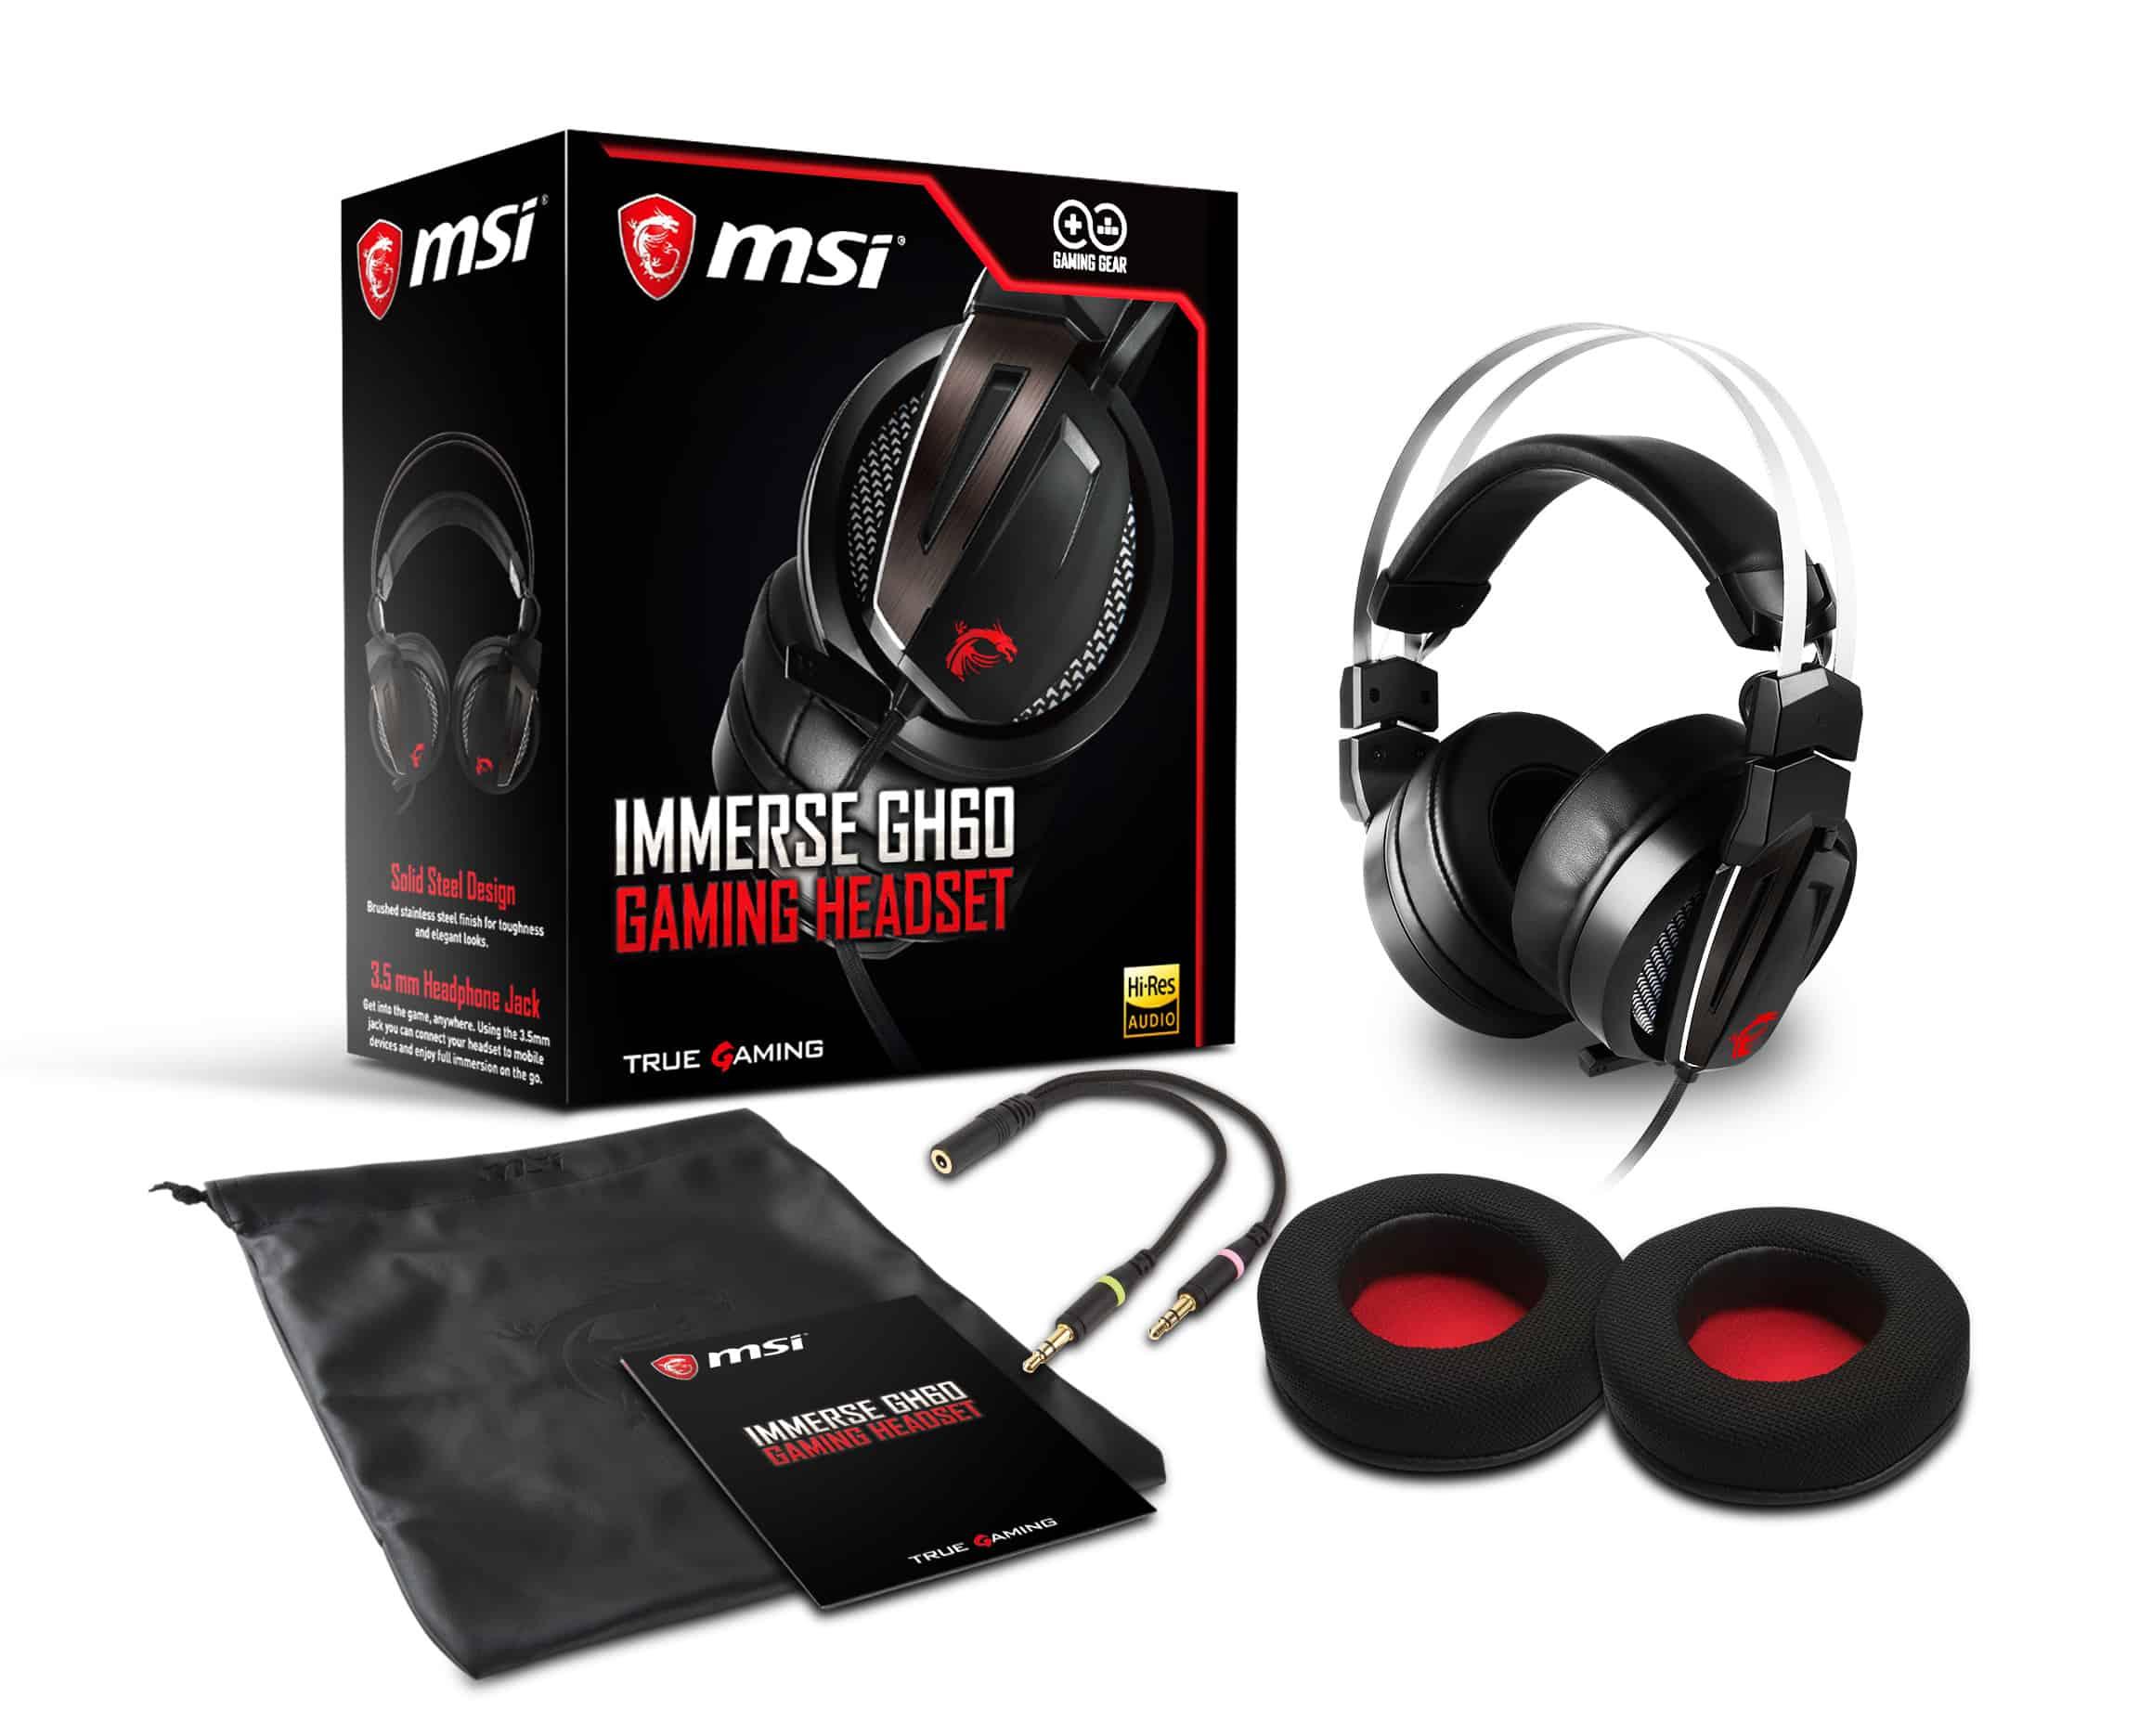 msi immerse gh60 gaming headset product photos boxshot2 - MSI annuncia le nuove cuffie GH60, tastiera Vigor GK40 e un set combo